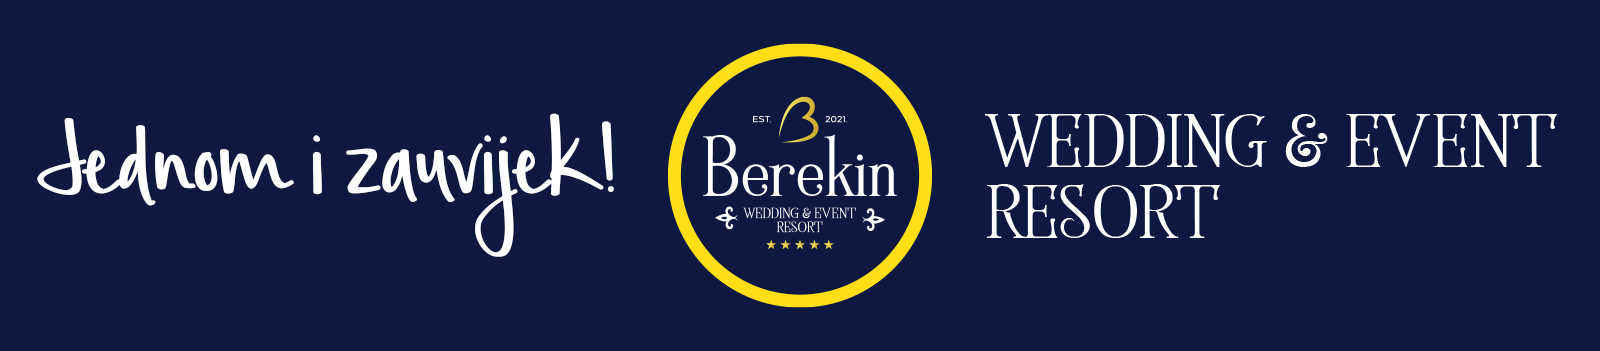 berekin-wedding-and-event-resort2